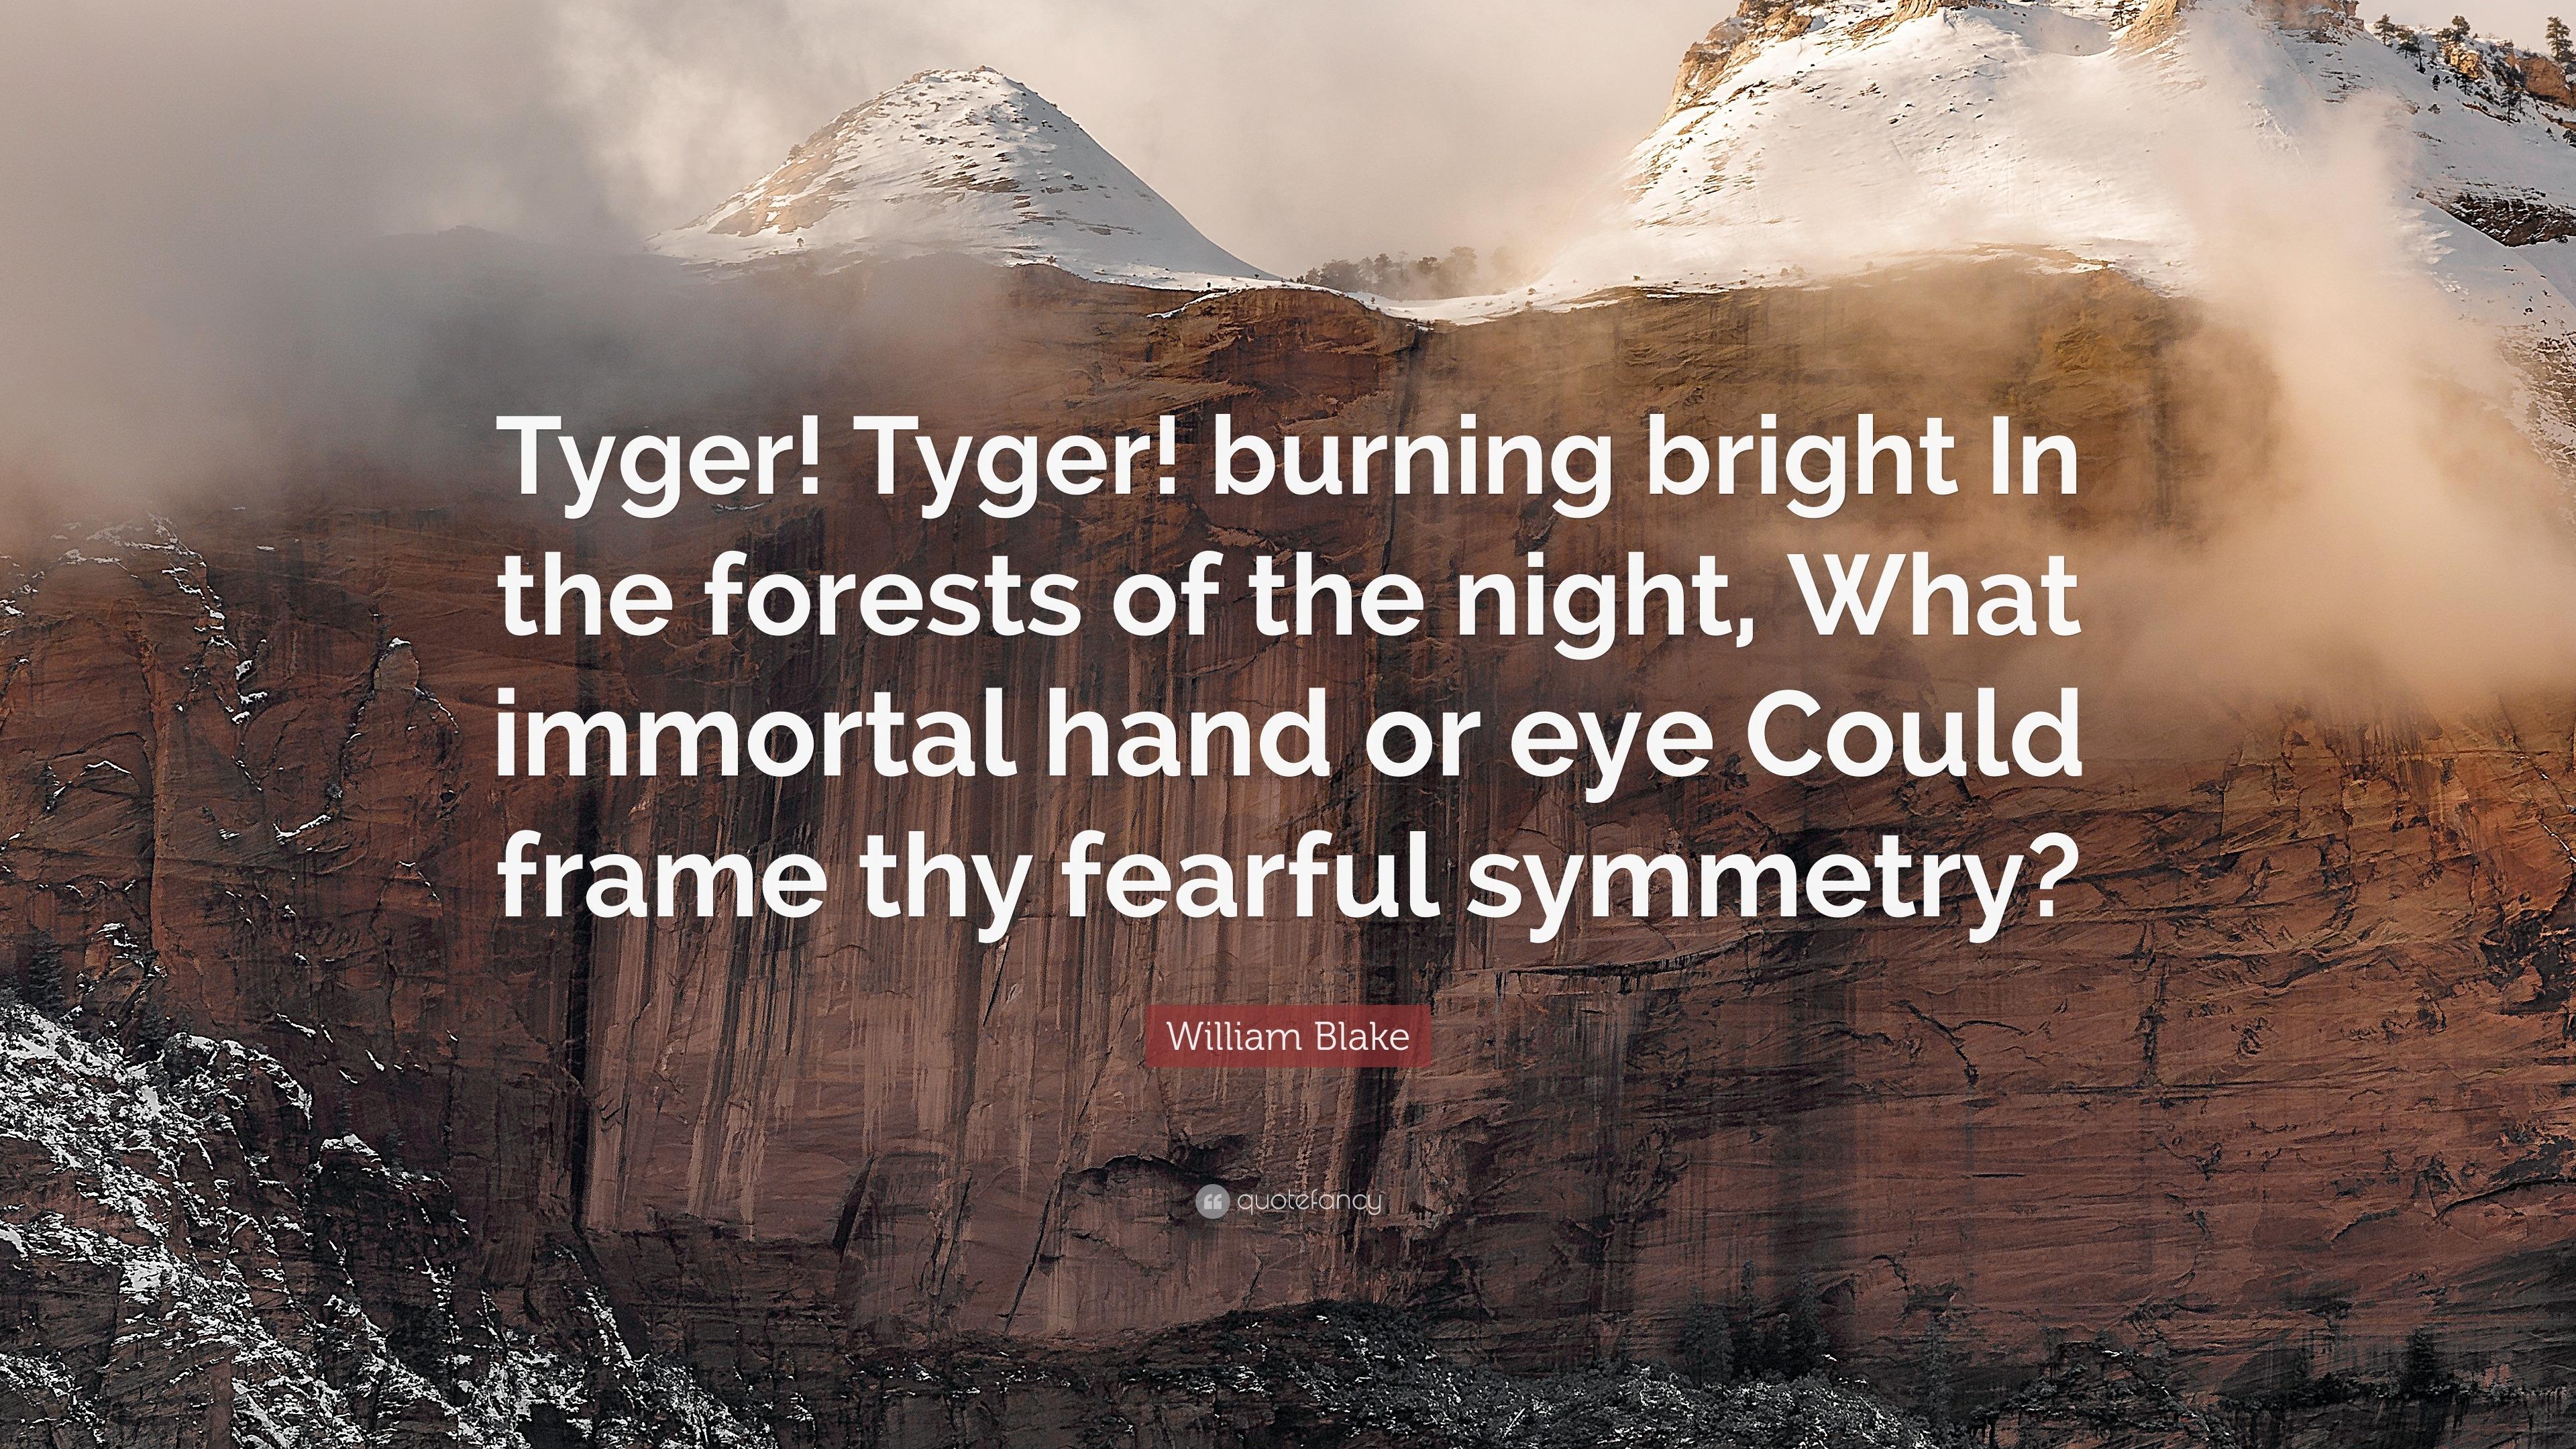 blake tiger tiger burning bright